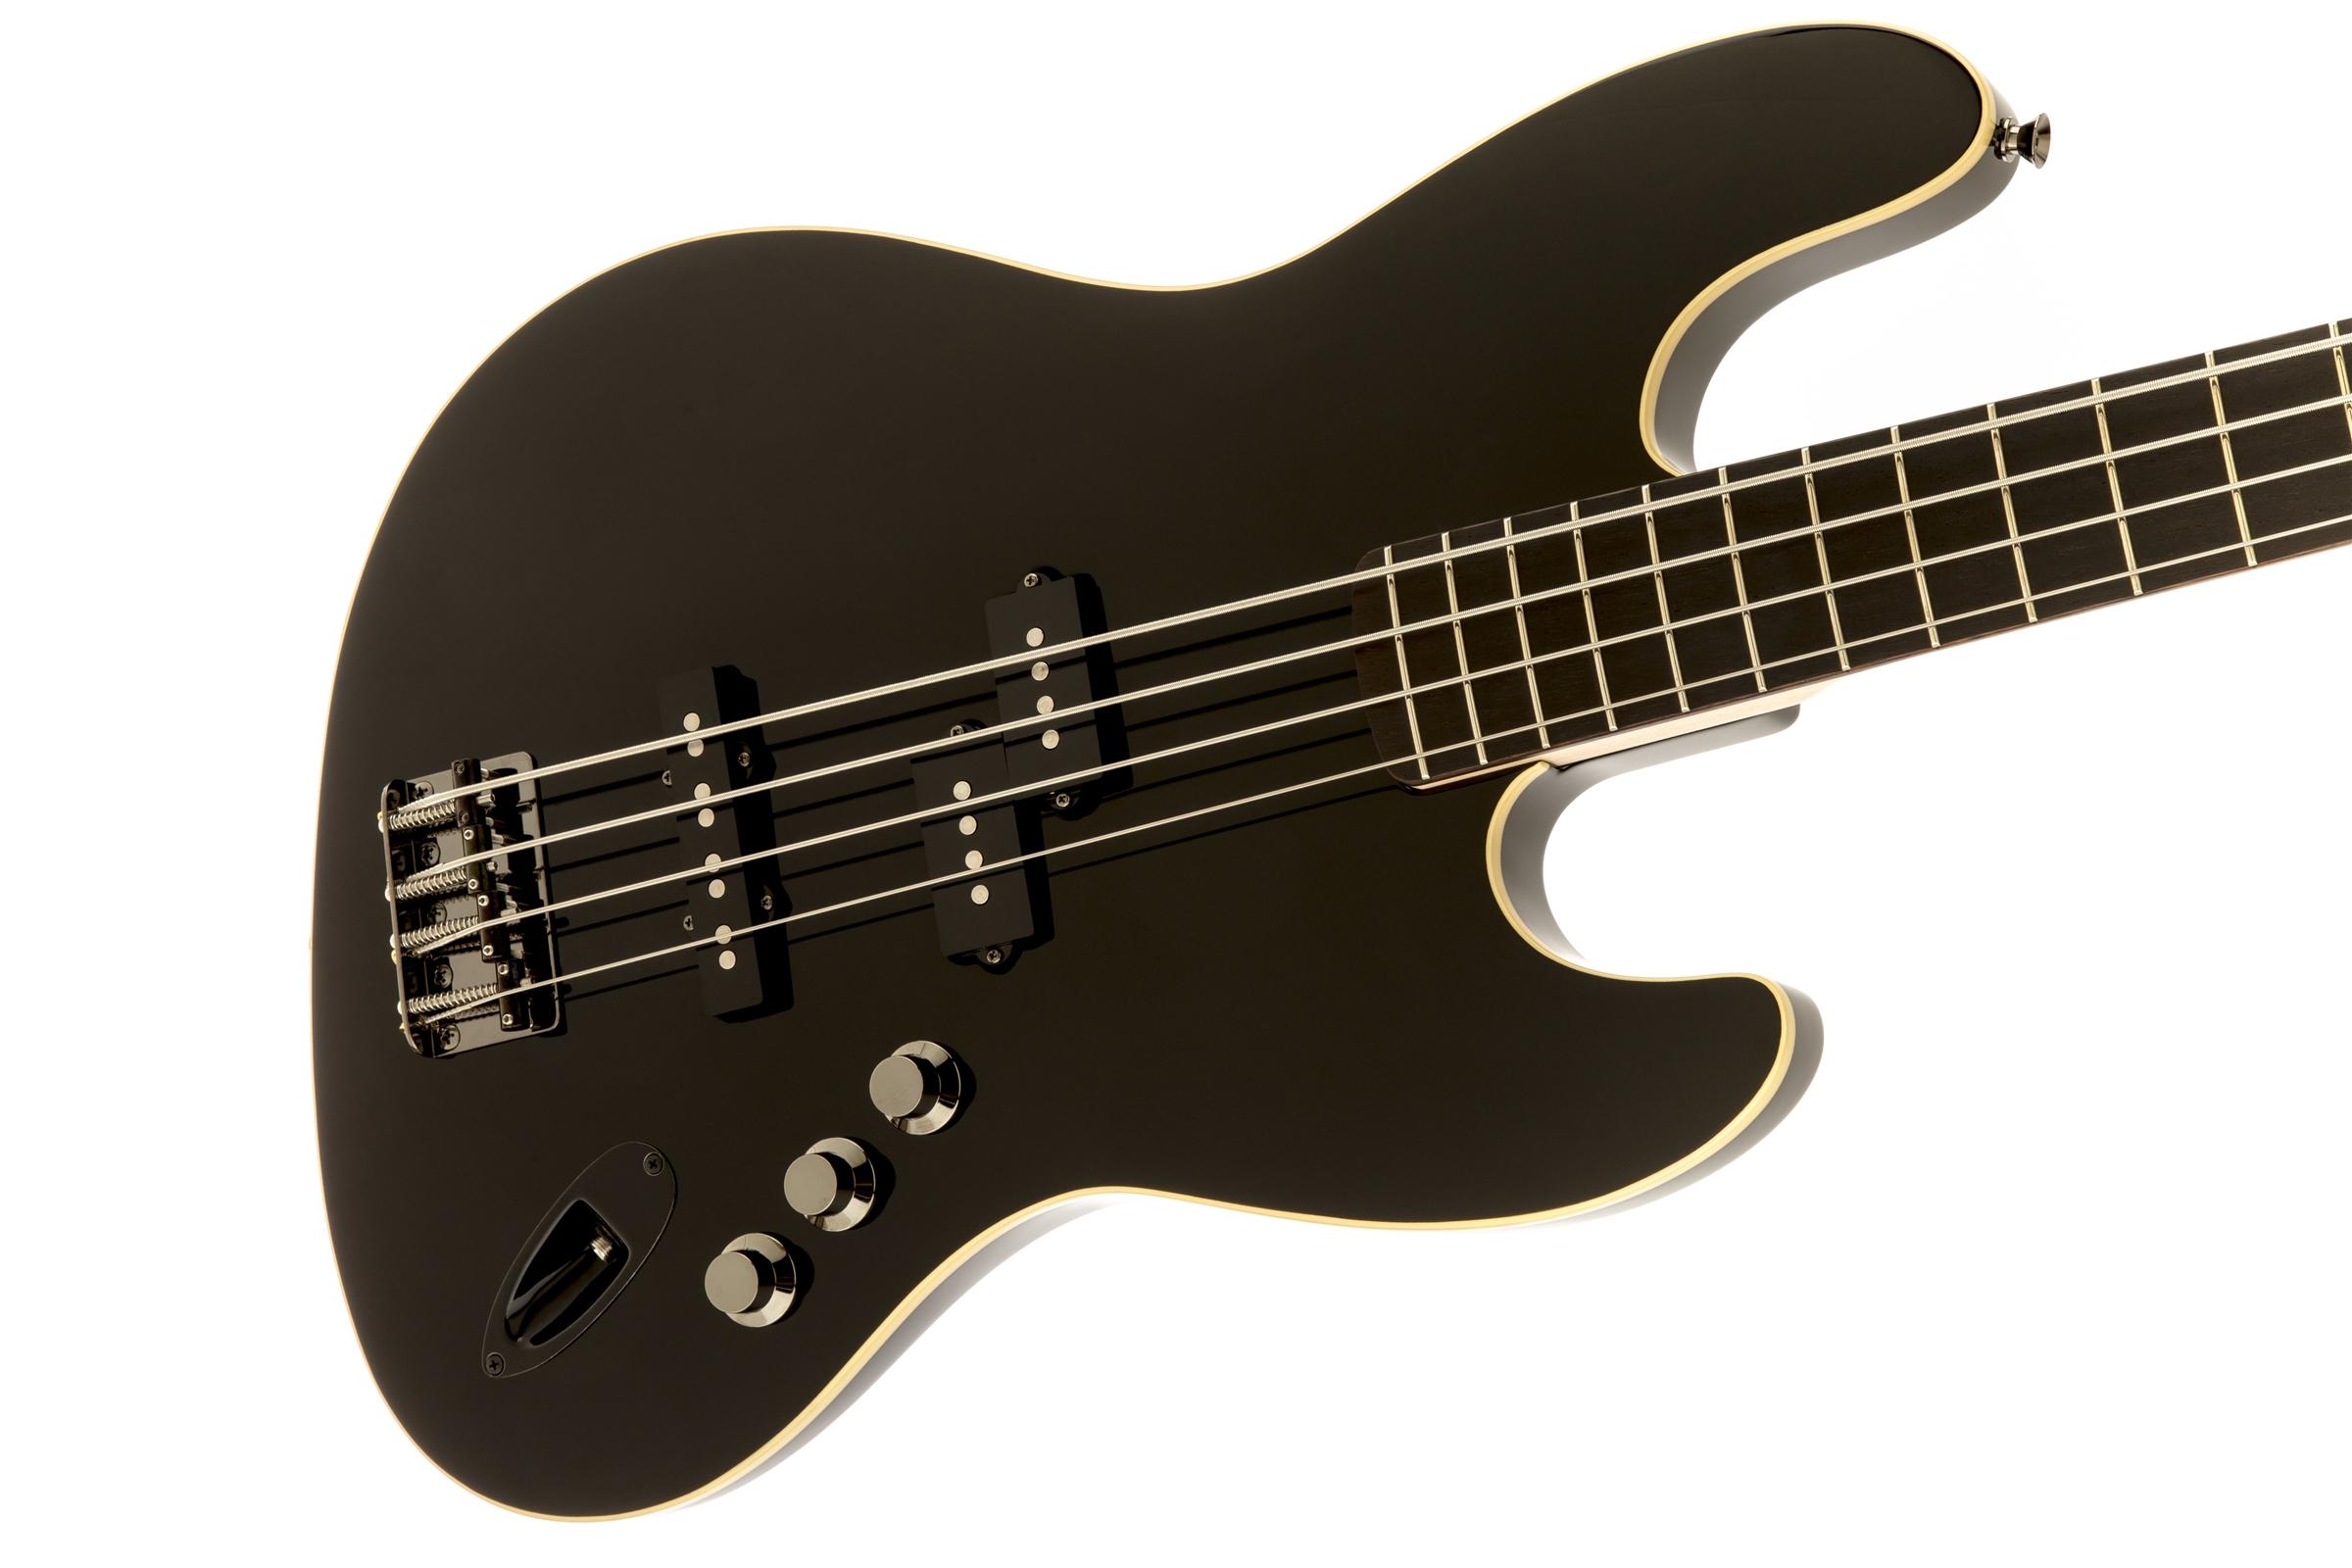 4 Saitig Bass Bridge Fender Precision Jazz Bass Ersatzteile E-Gitarre Teile